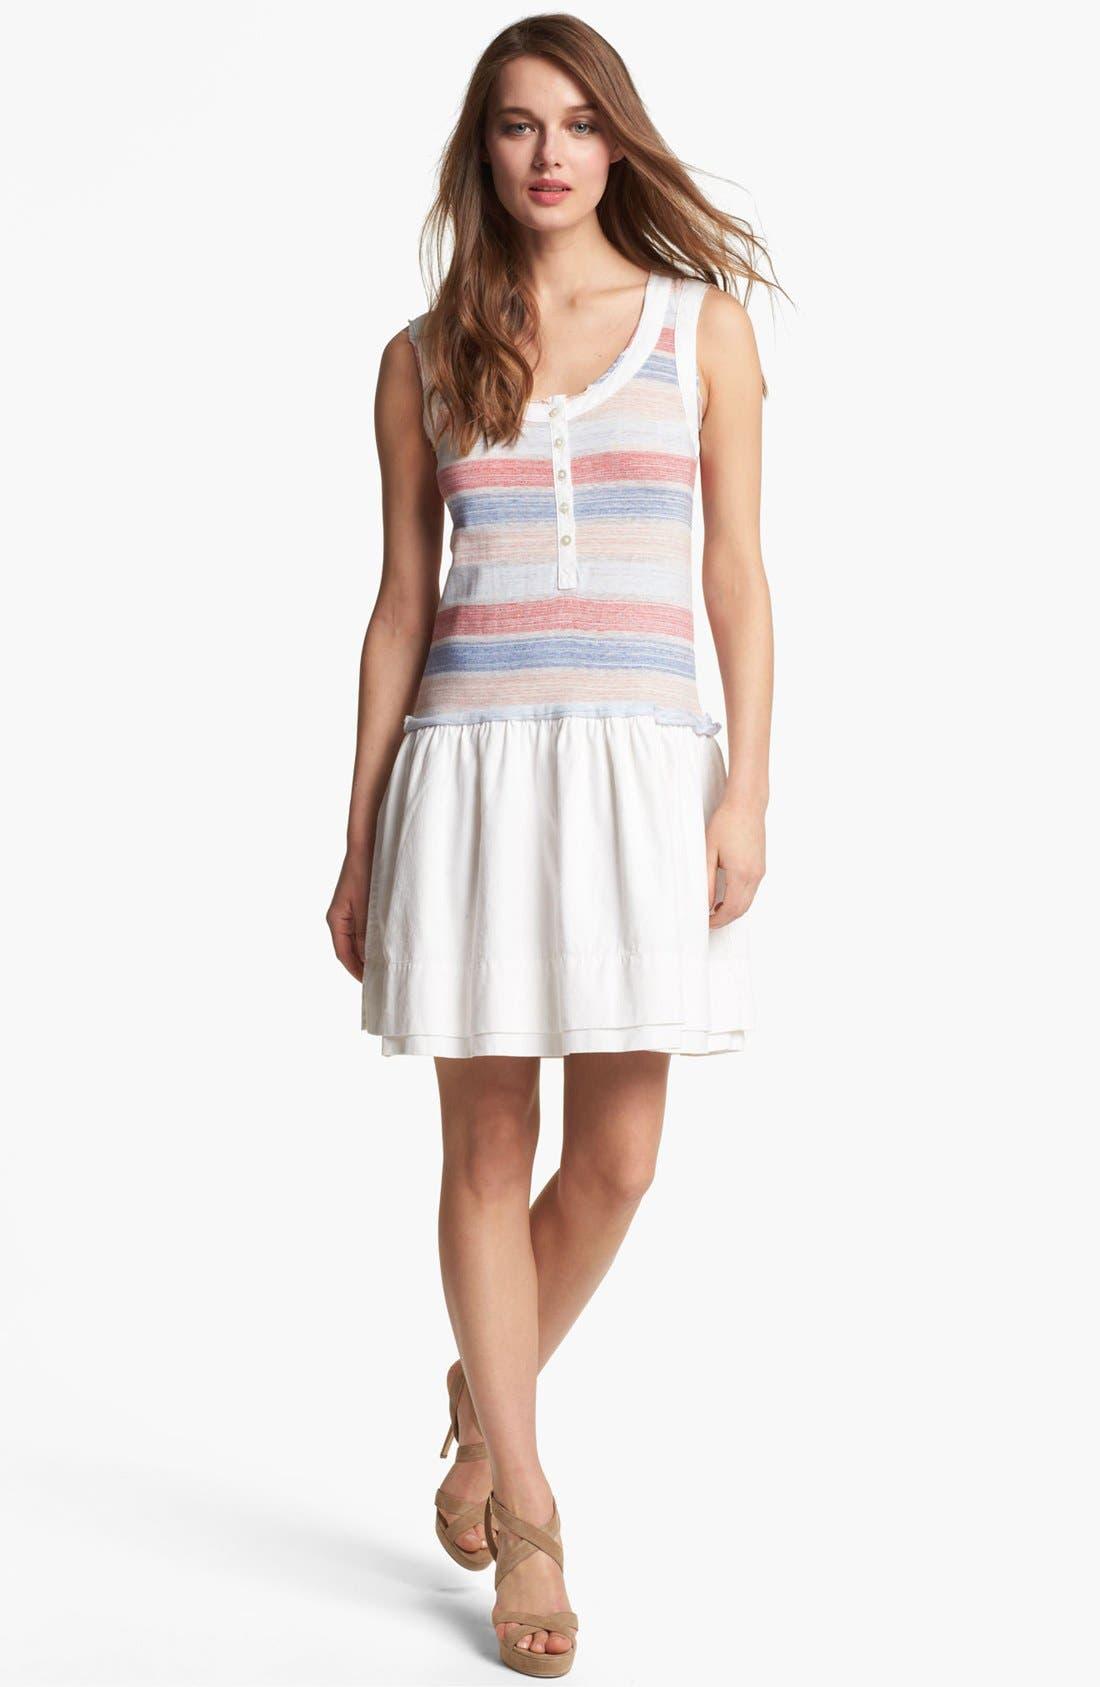 Alternate Image 1 Selected - MARC BY MARC JACOBS 'Sketch' Stripe Cotton Blend Tank Dress